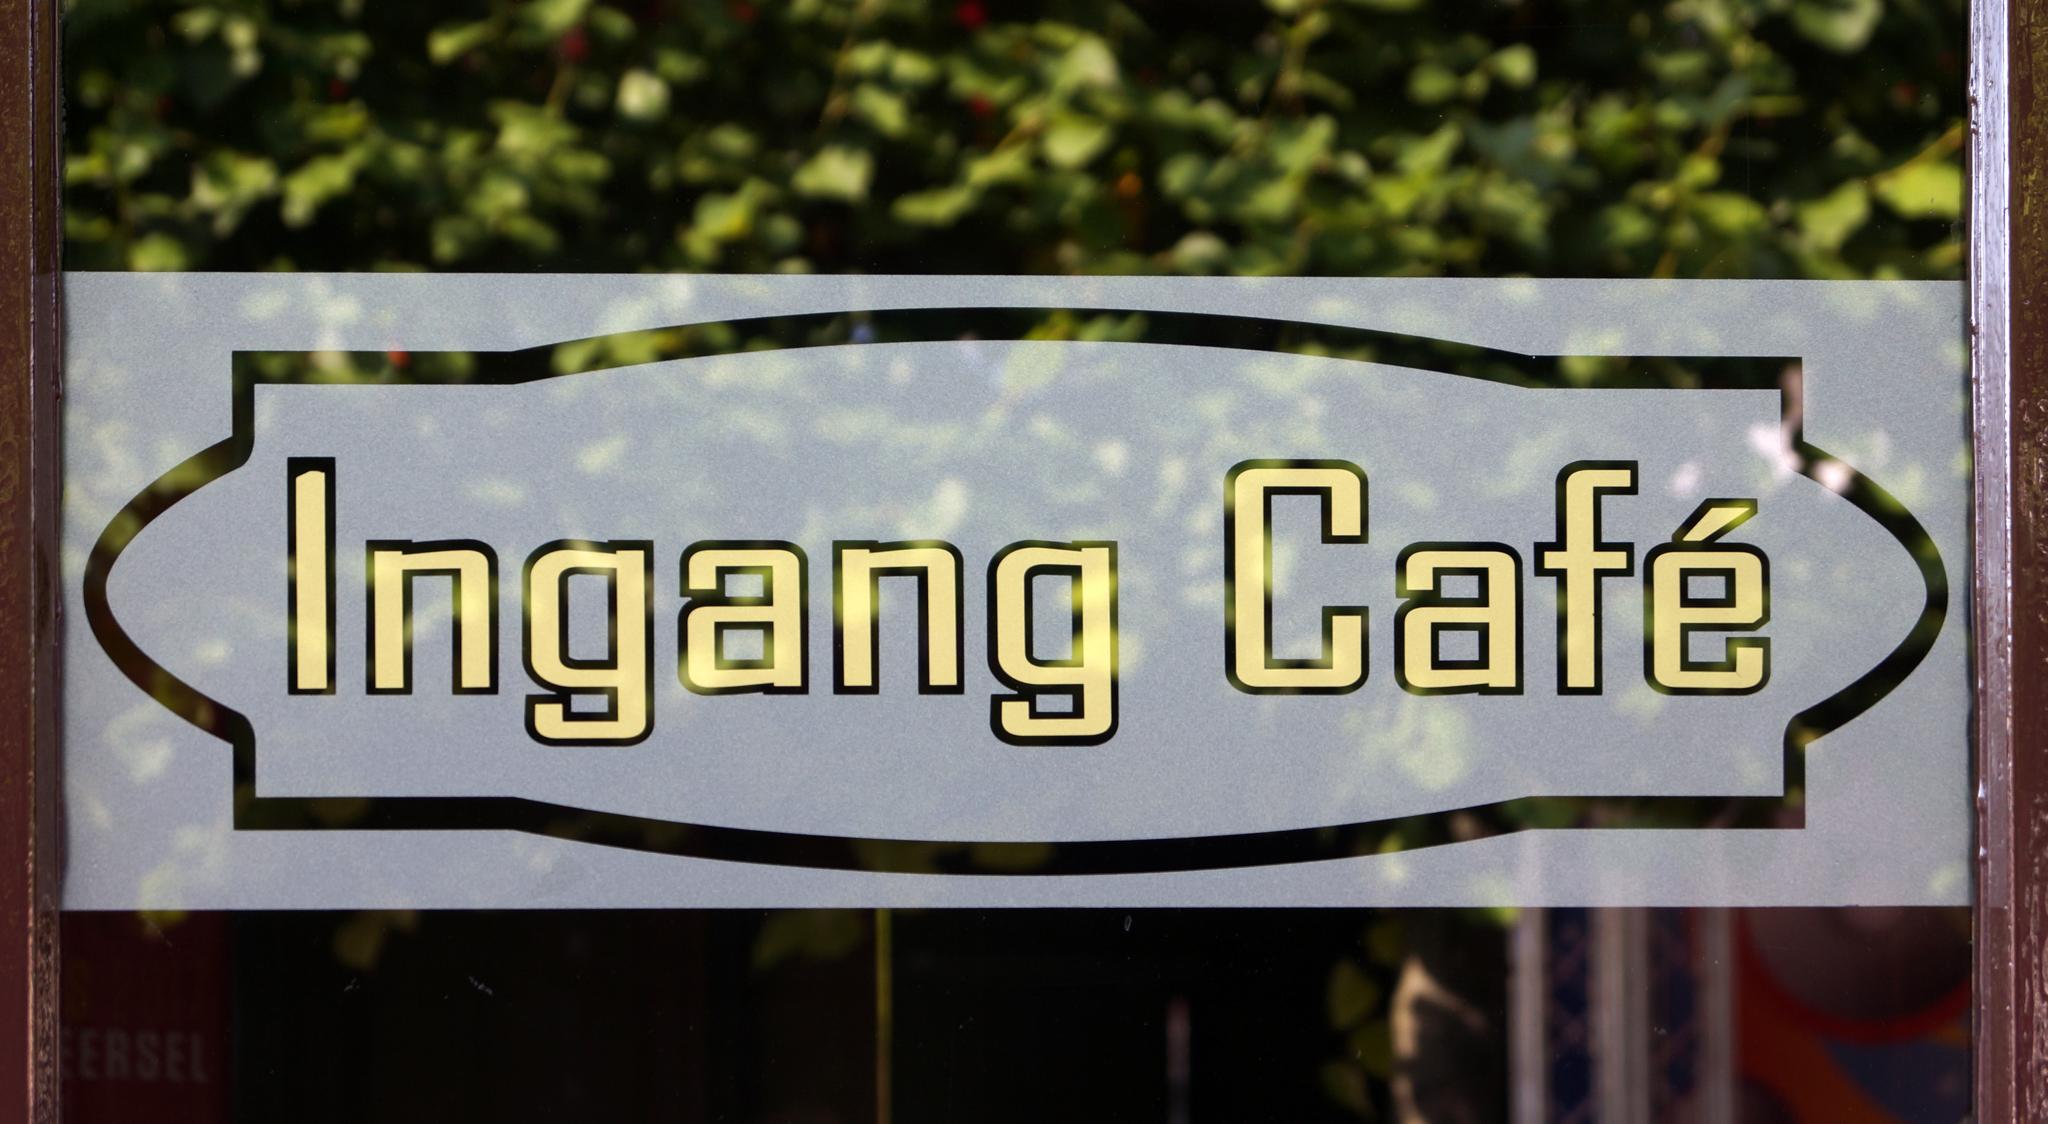 Ingang café de Gouden Leeuw